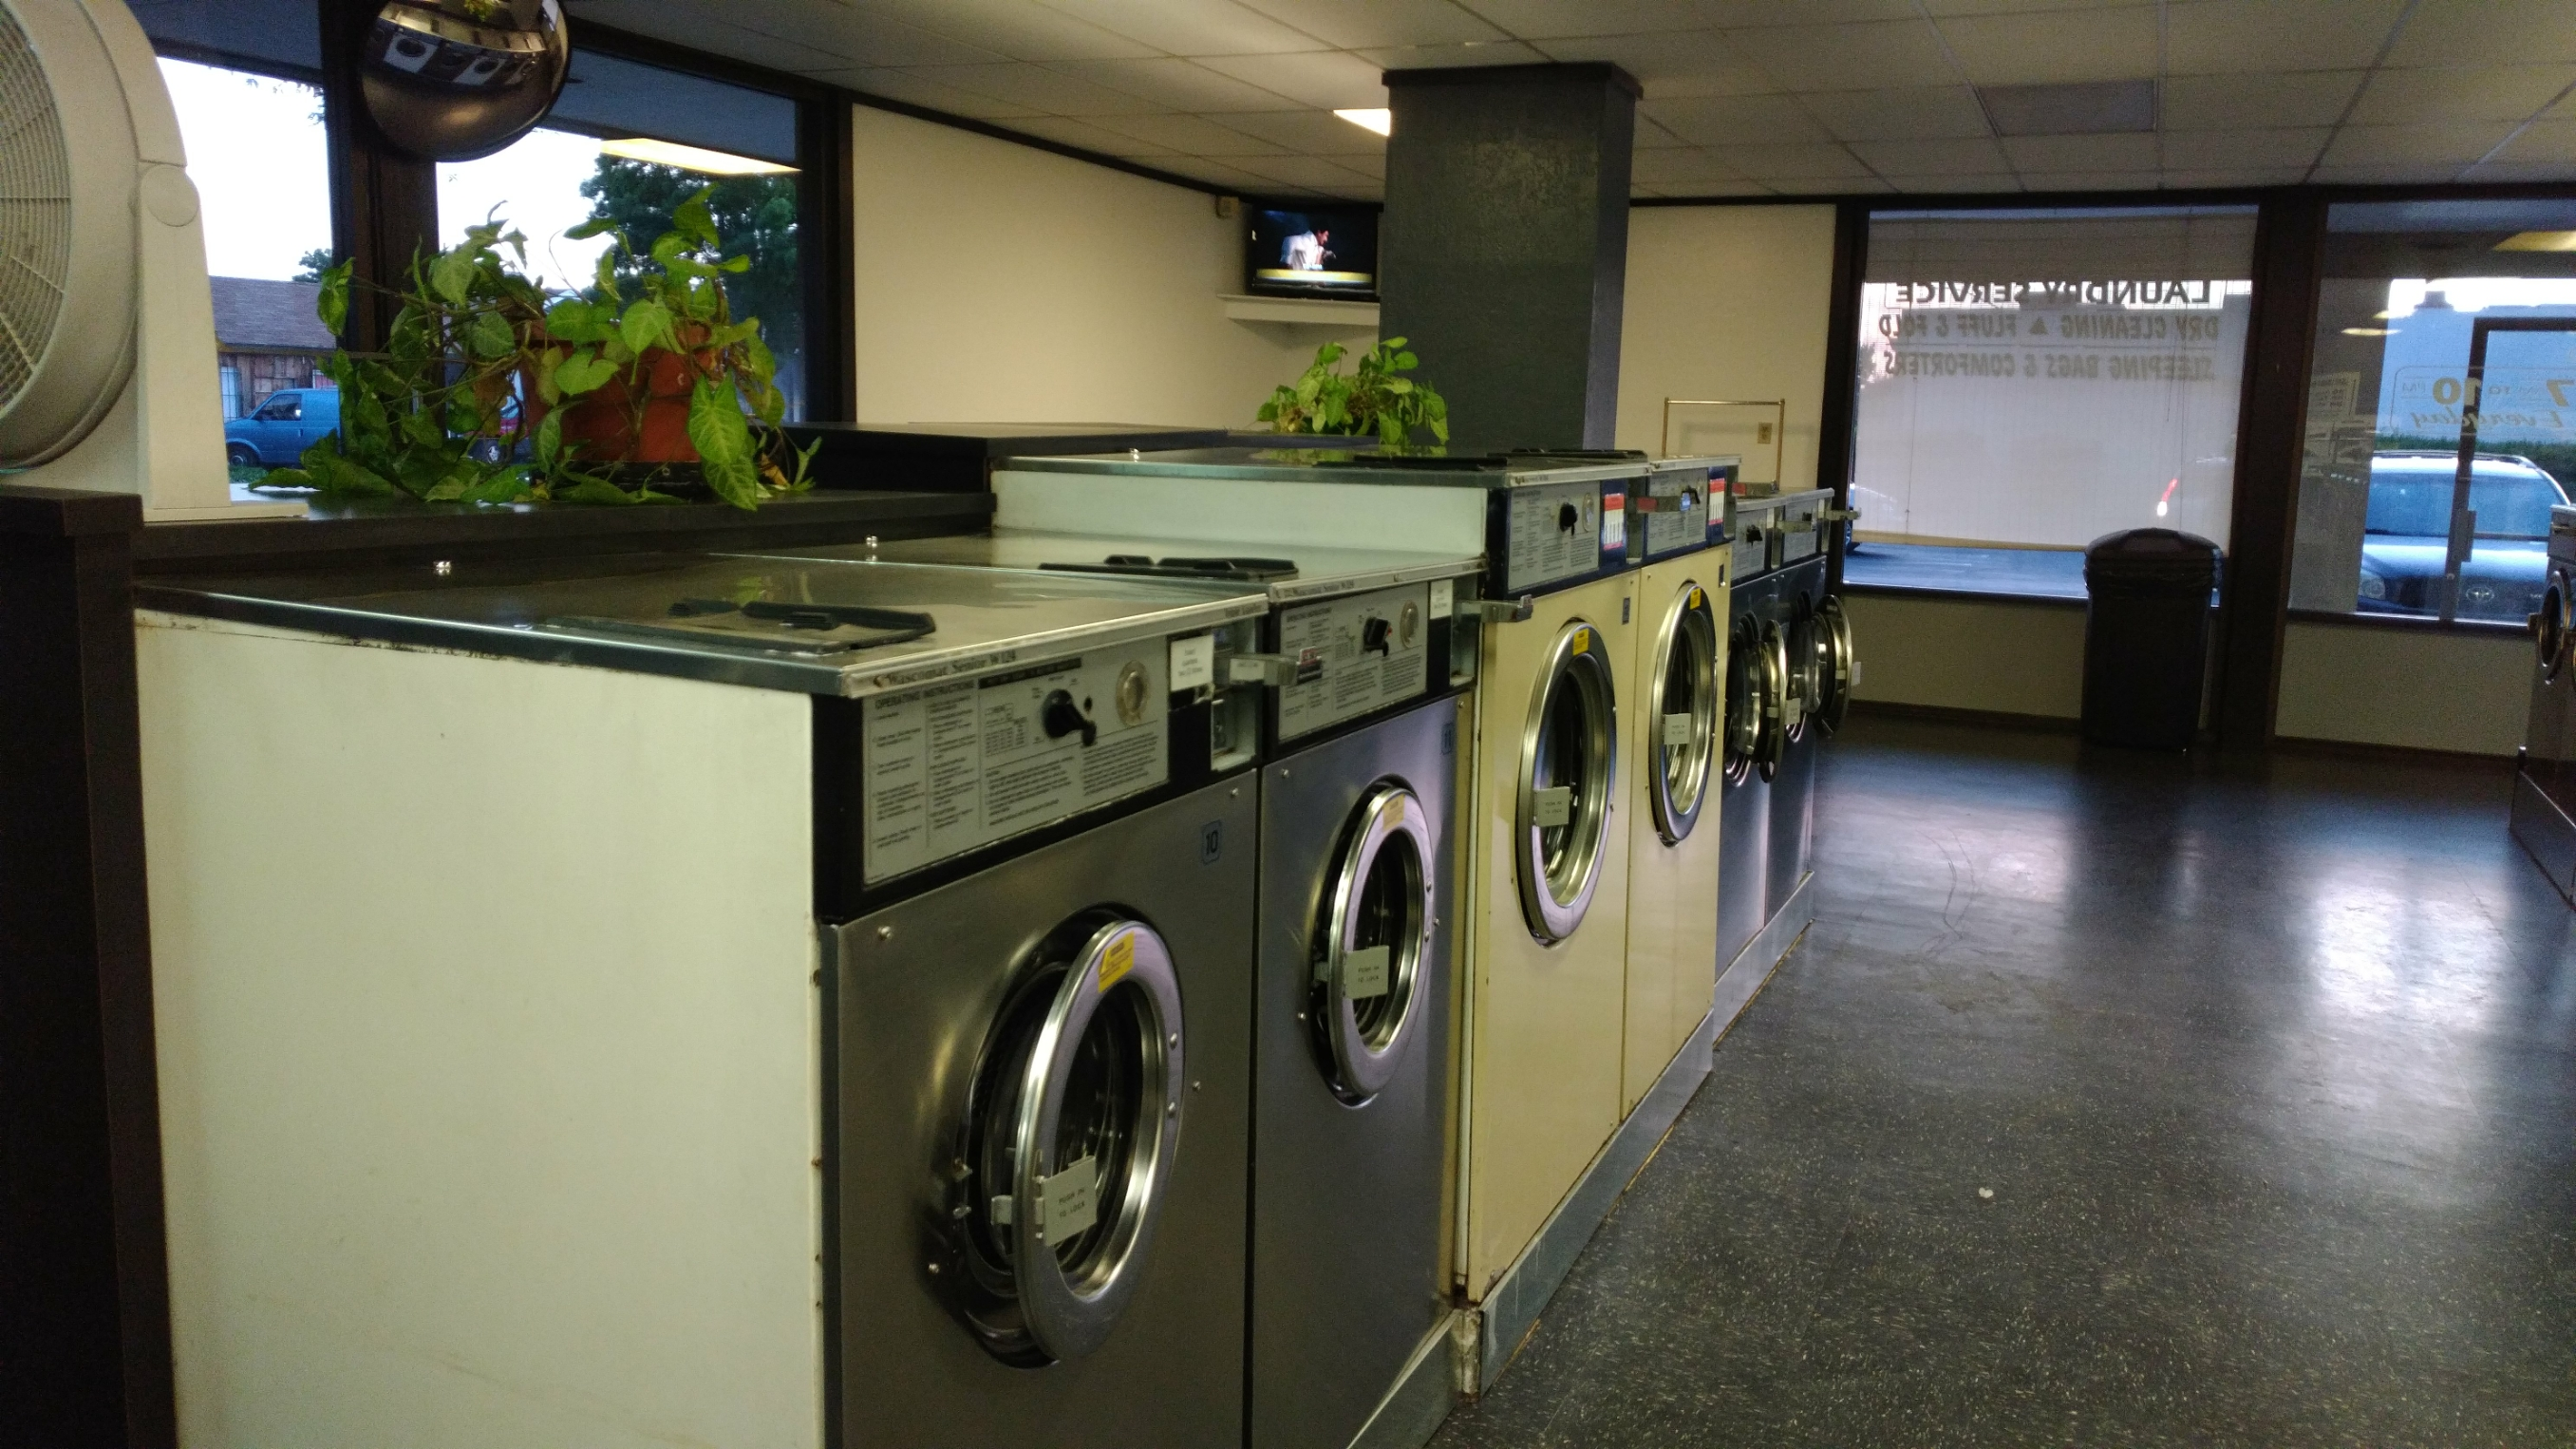 Neighborhood laundry 986 east ave chico ca 95926 yp solutioingenieria Choice Image